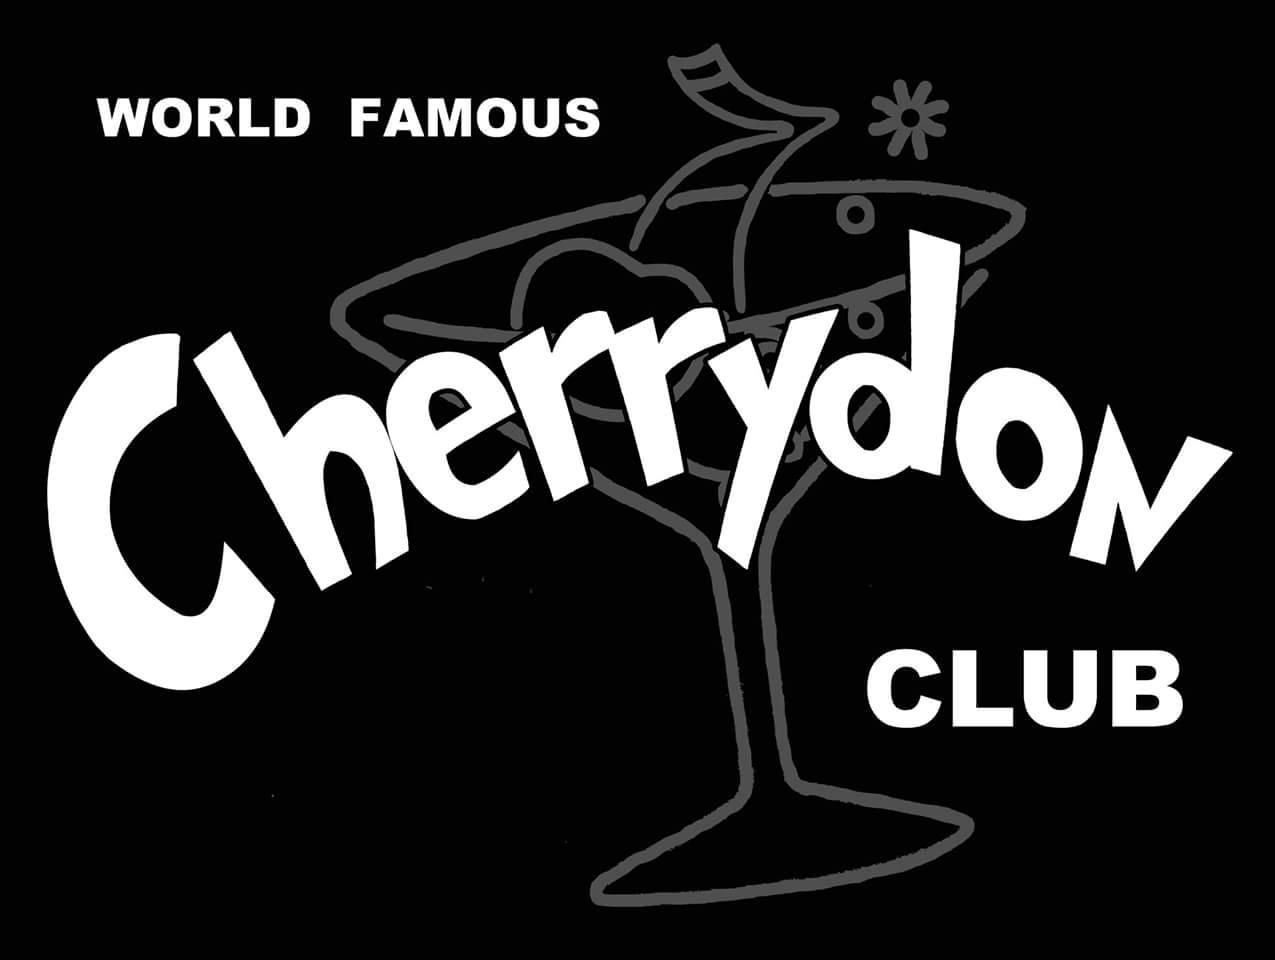 Cherrydon Club